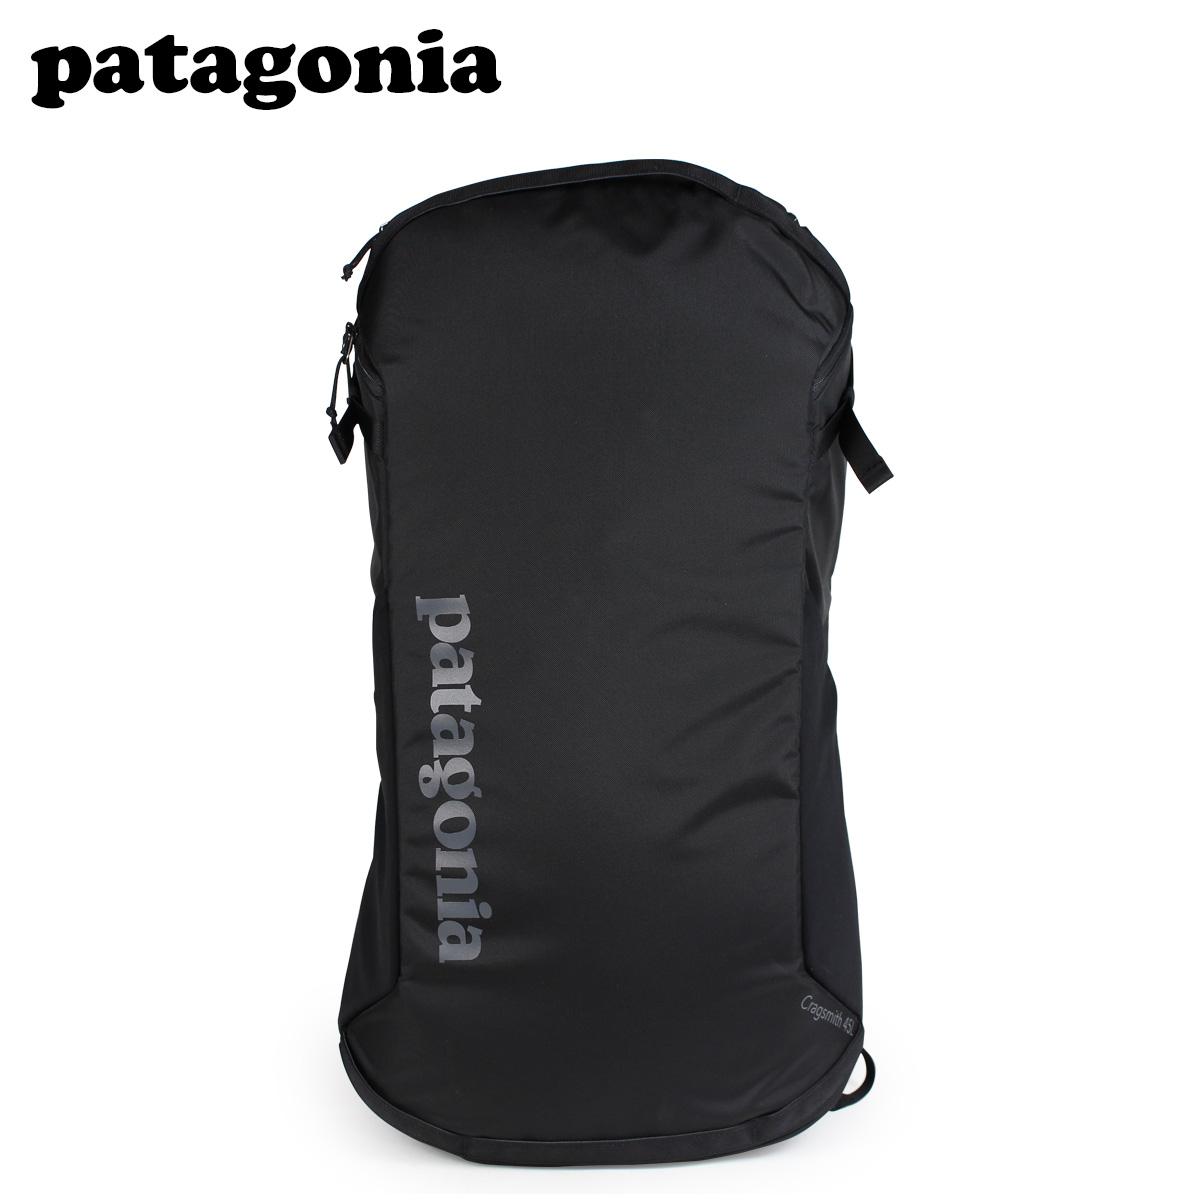 patagonia CRAGSMITH パタゴニア リュック バックパック 45L メンズ レディース ブラック 48065 [10/5 新入荷]